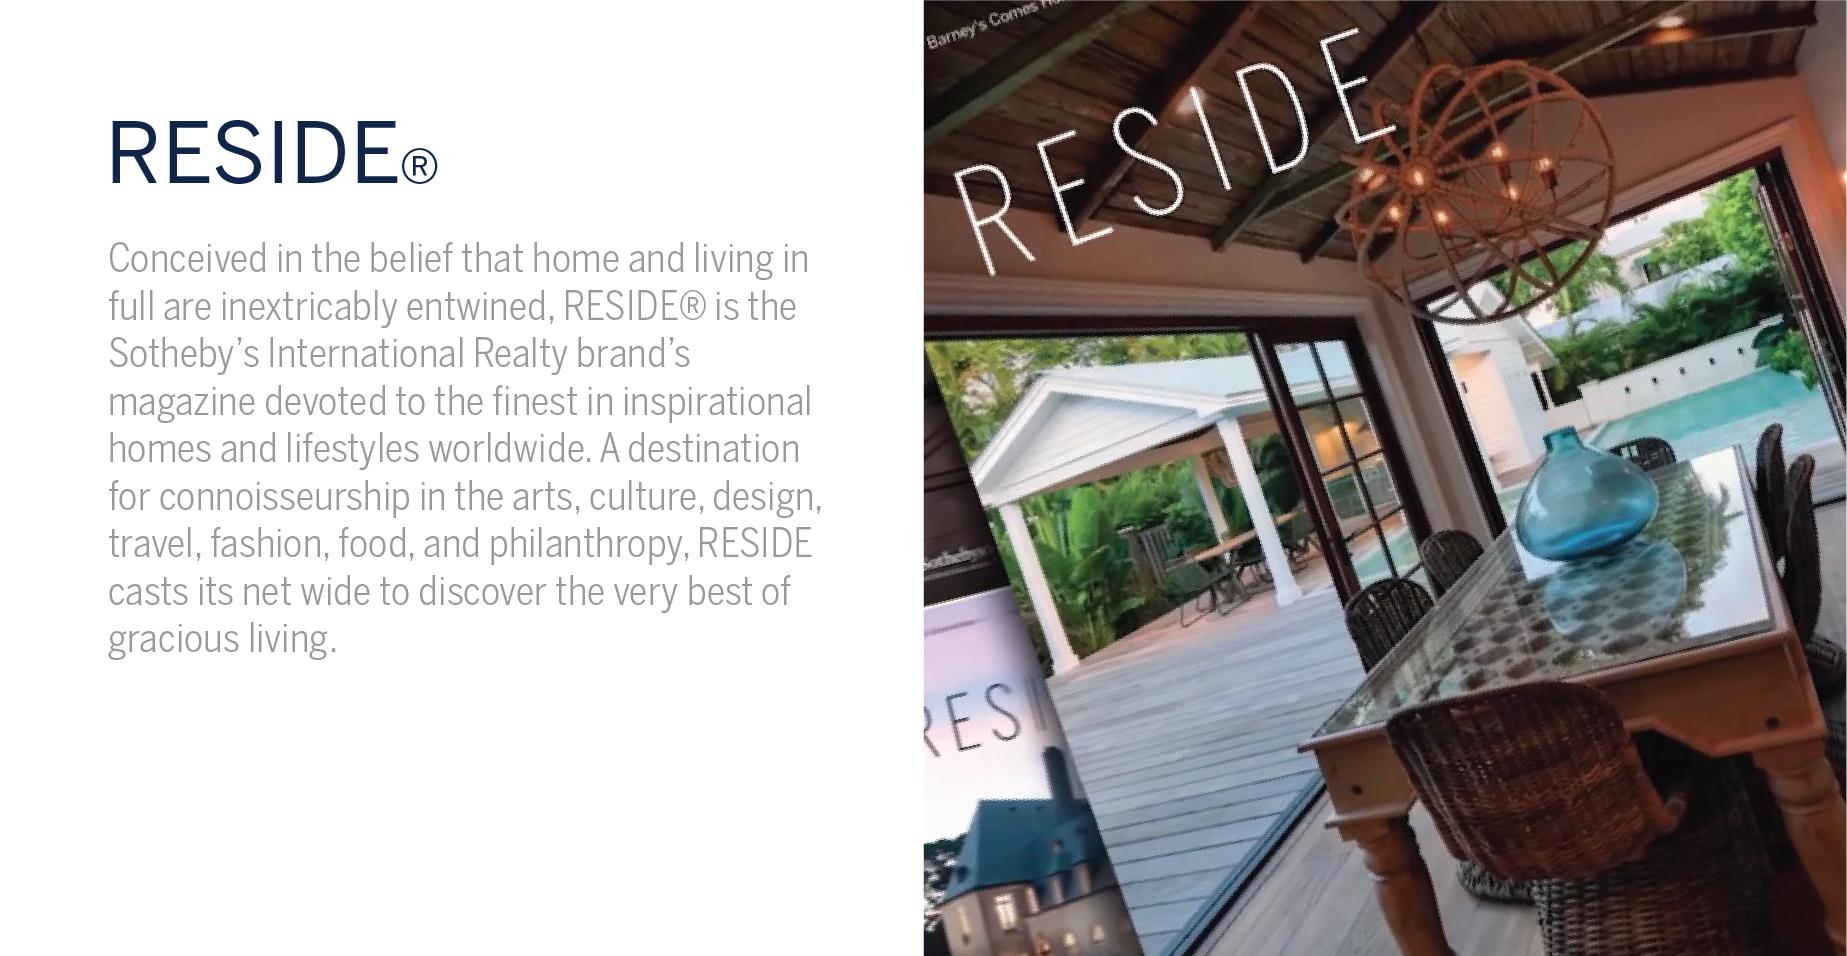 Reside Magazine